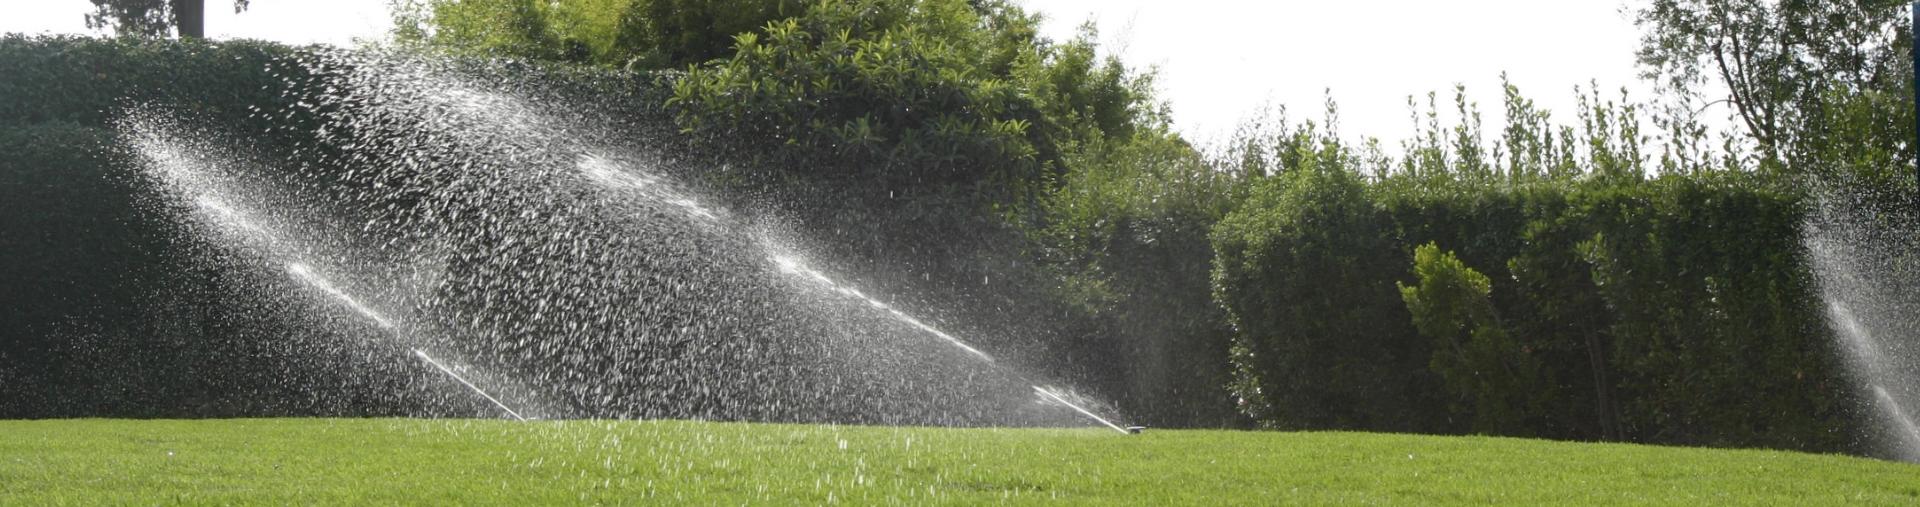 Impianti-irrigazione